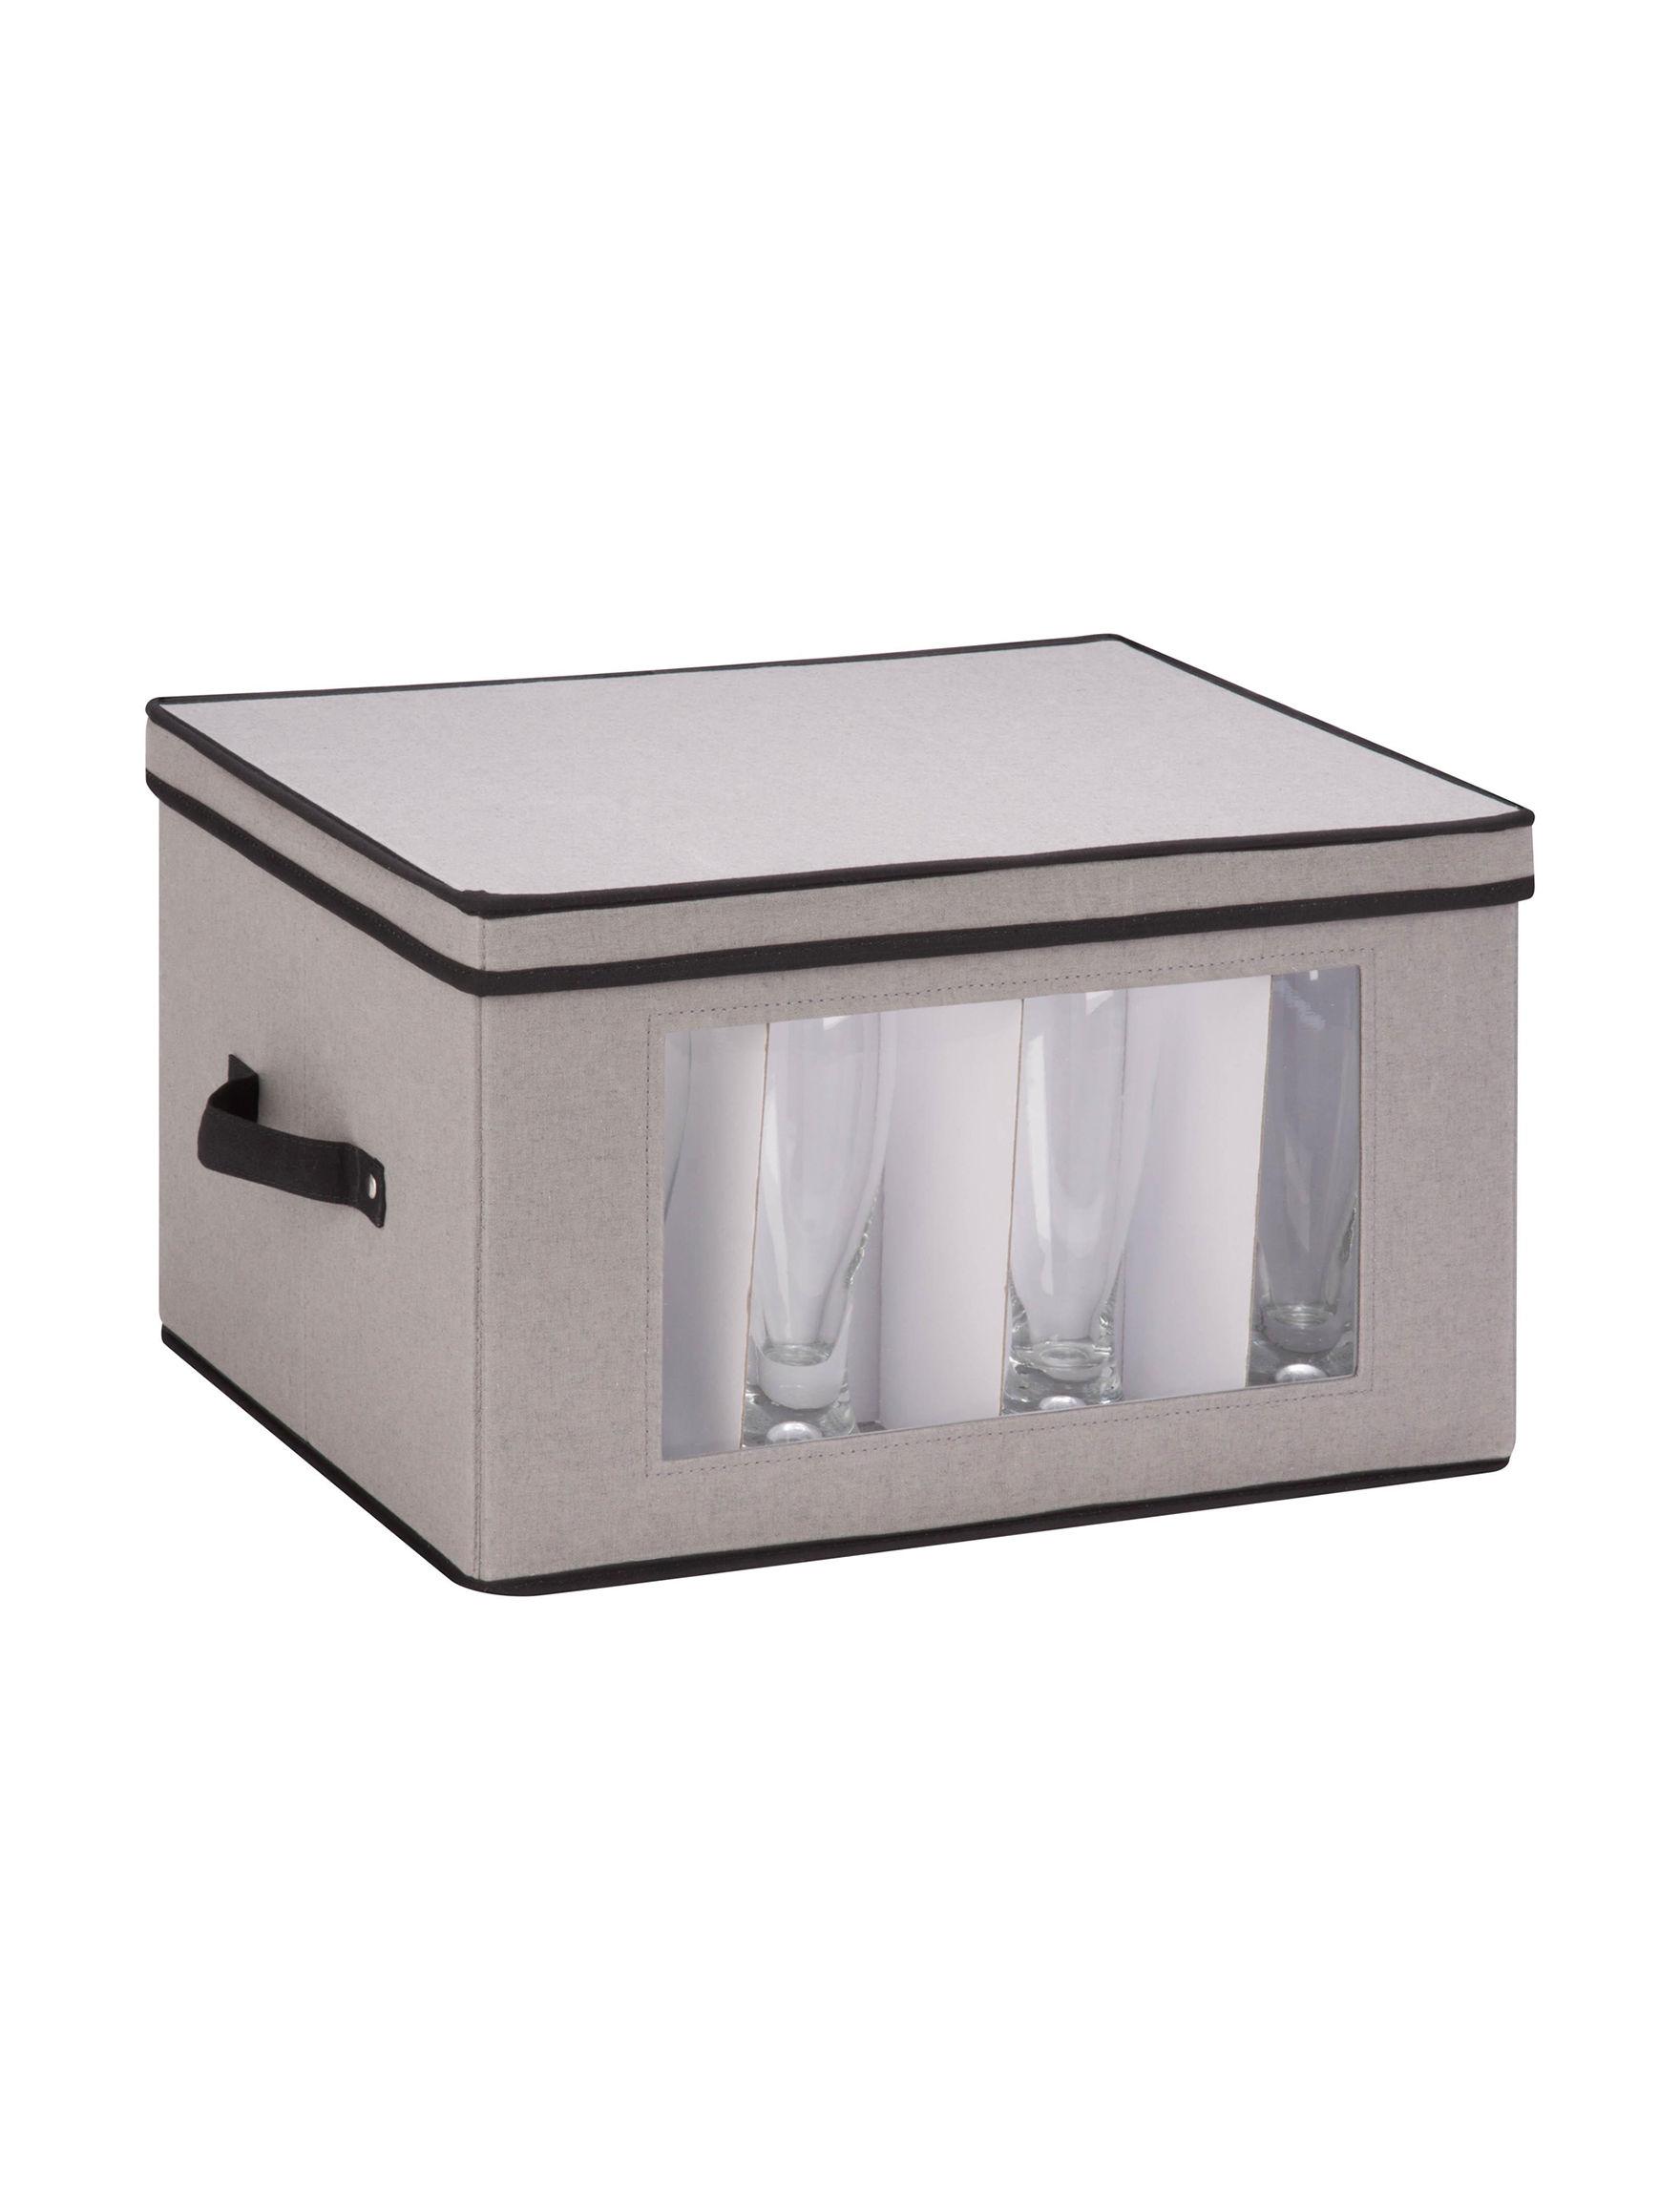 Honey-Can-Do International Grey Storage & Organization